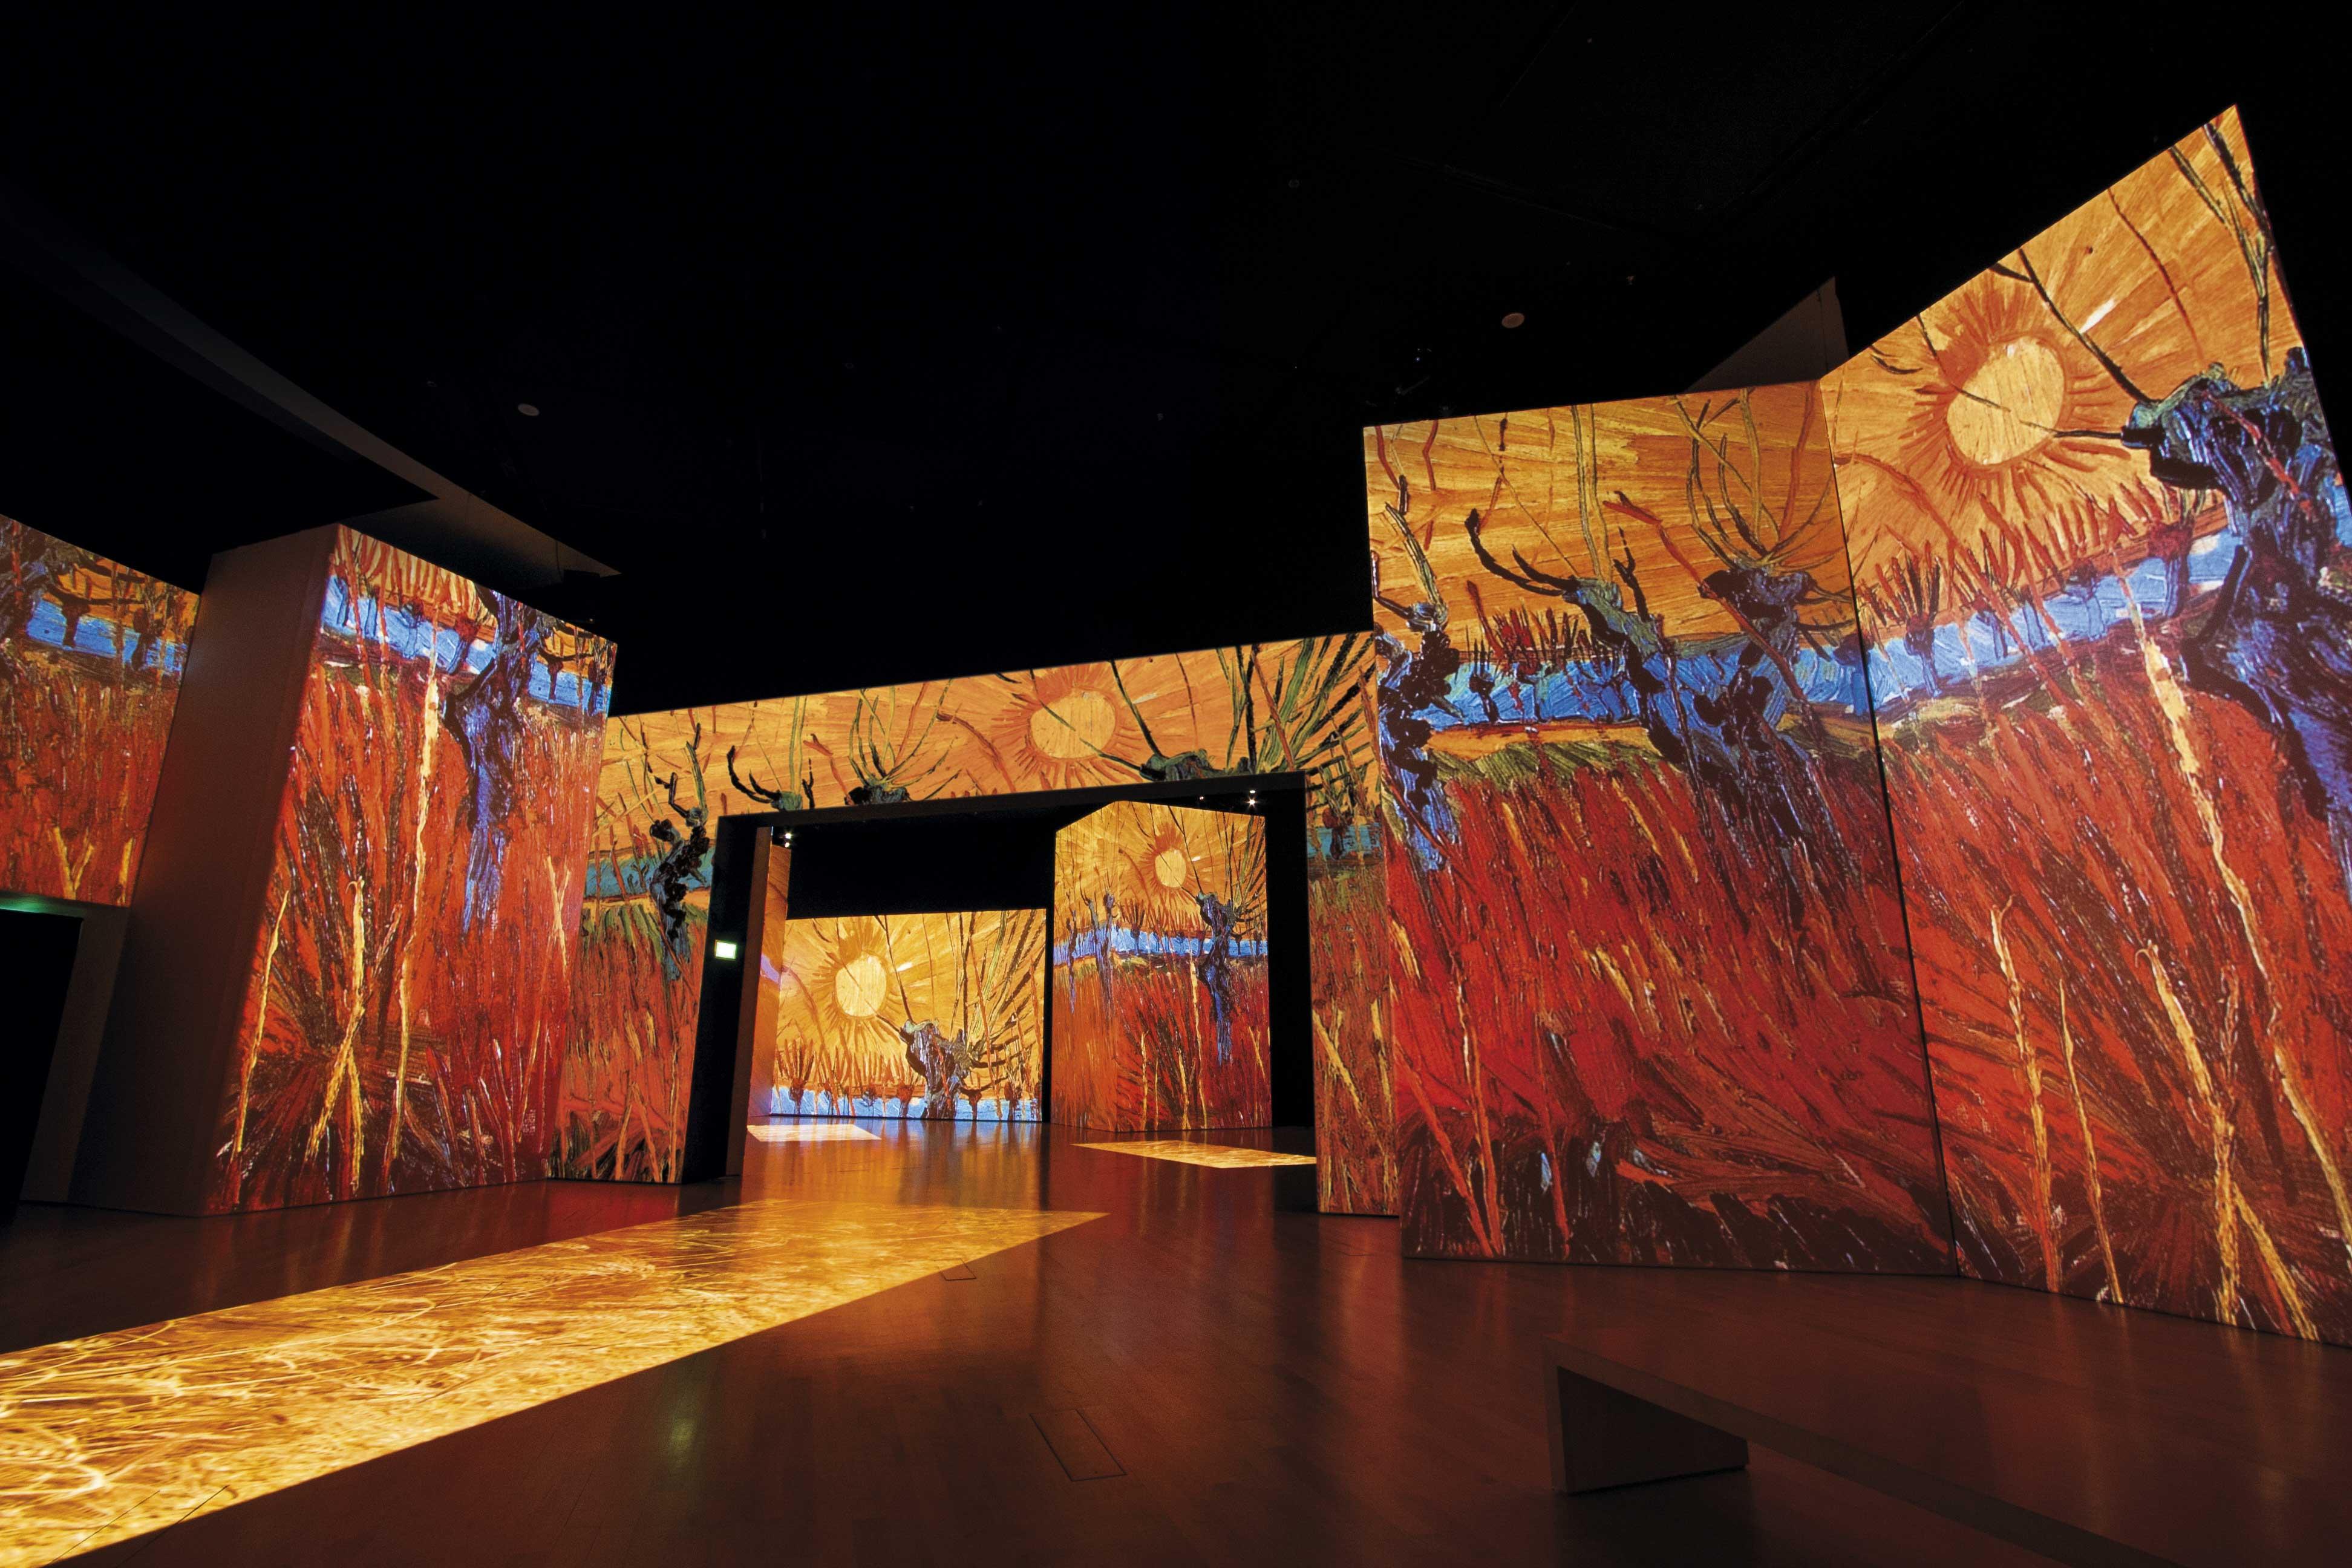 Va A Ninetynine La Gestione Del Tour Italiano Di Van Gogh